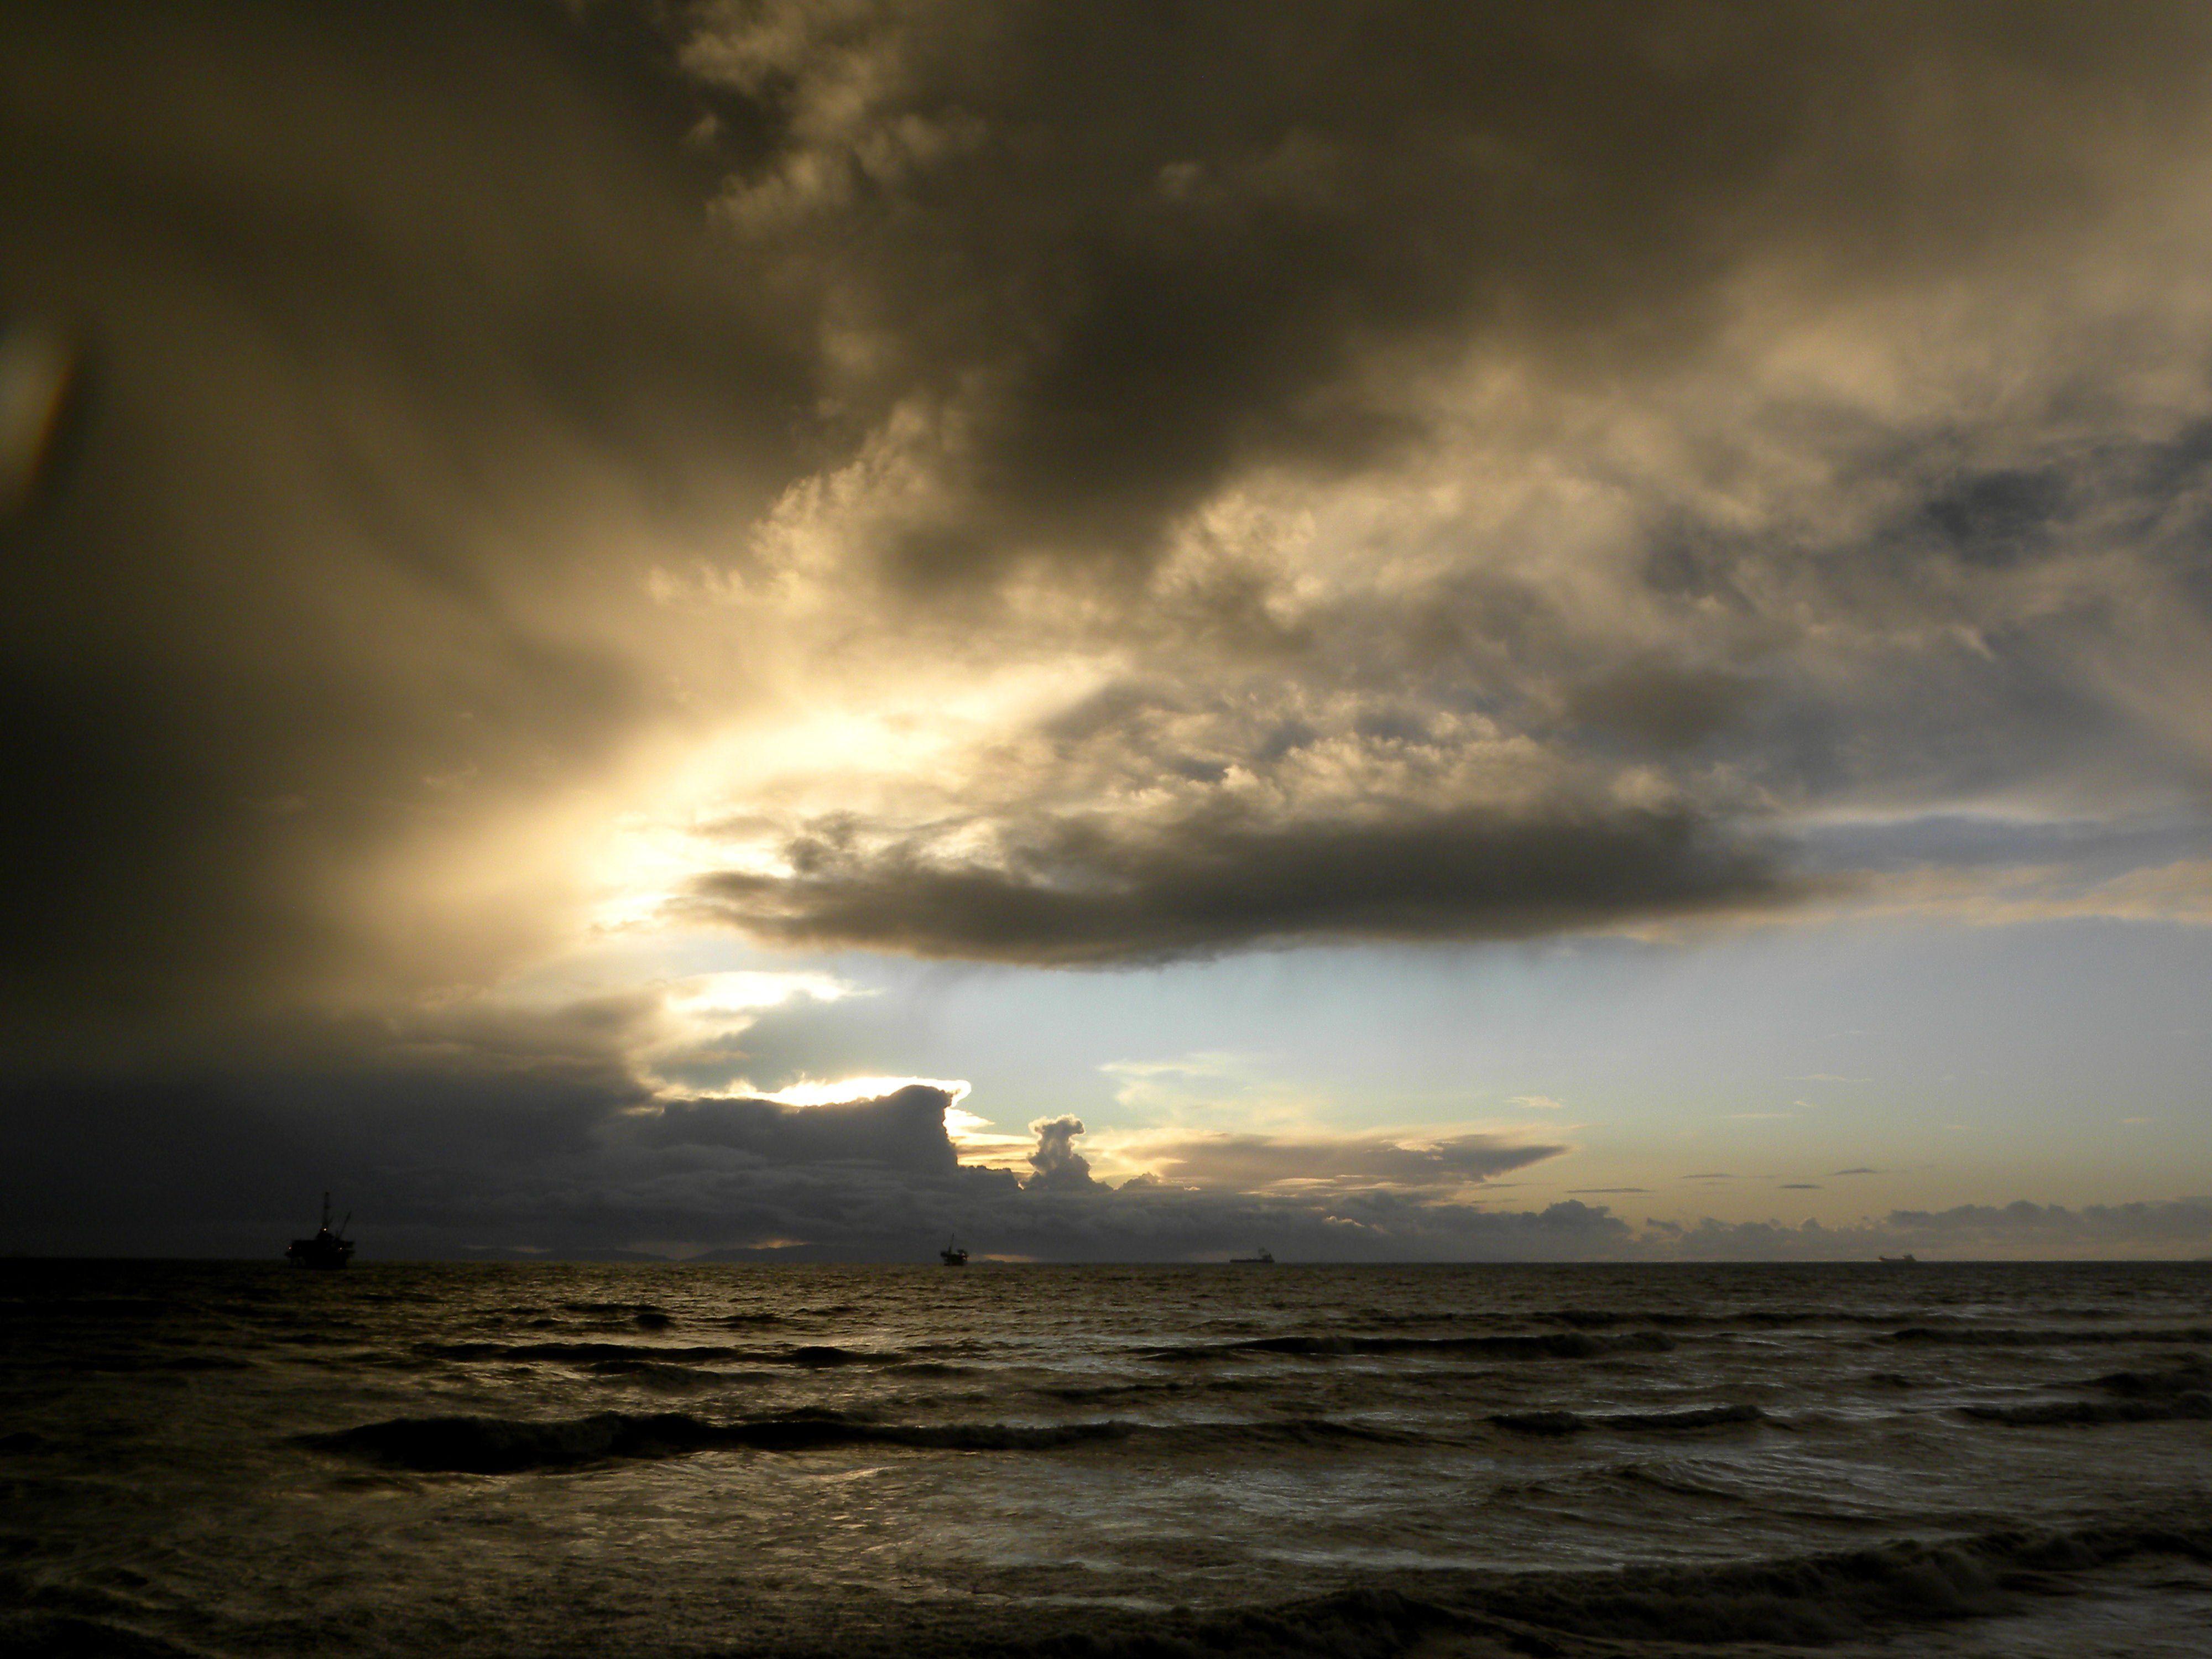 Storm Weather Rain Sky Clouds Nature Sea Ocean Landscape Sunset Sunrise Wallpaper 4000x3000 838646 Wallpaperup Ocean Landscape Clouds Sunrise Wallpaper